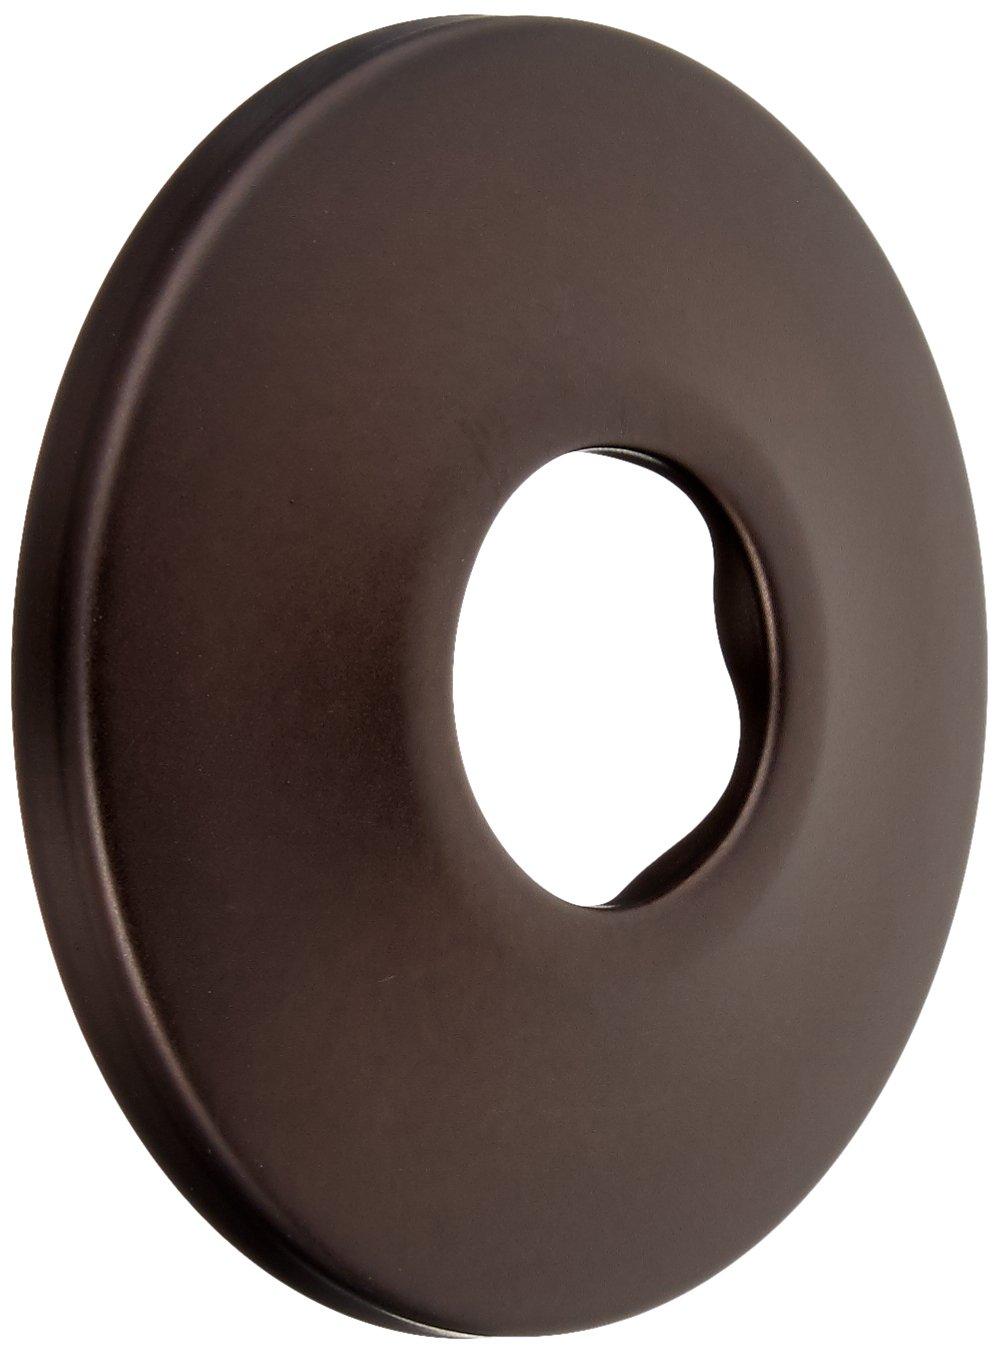 Jones Stephens E0205RB Escutcheon Oil Rubbed Bronze Low Pattern